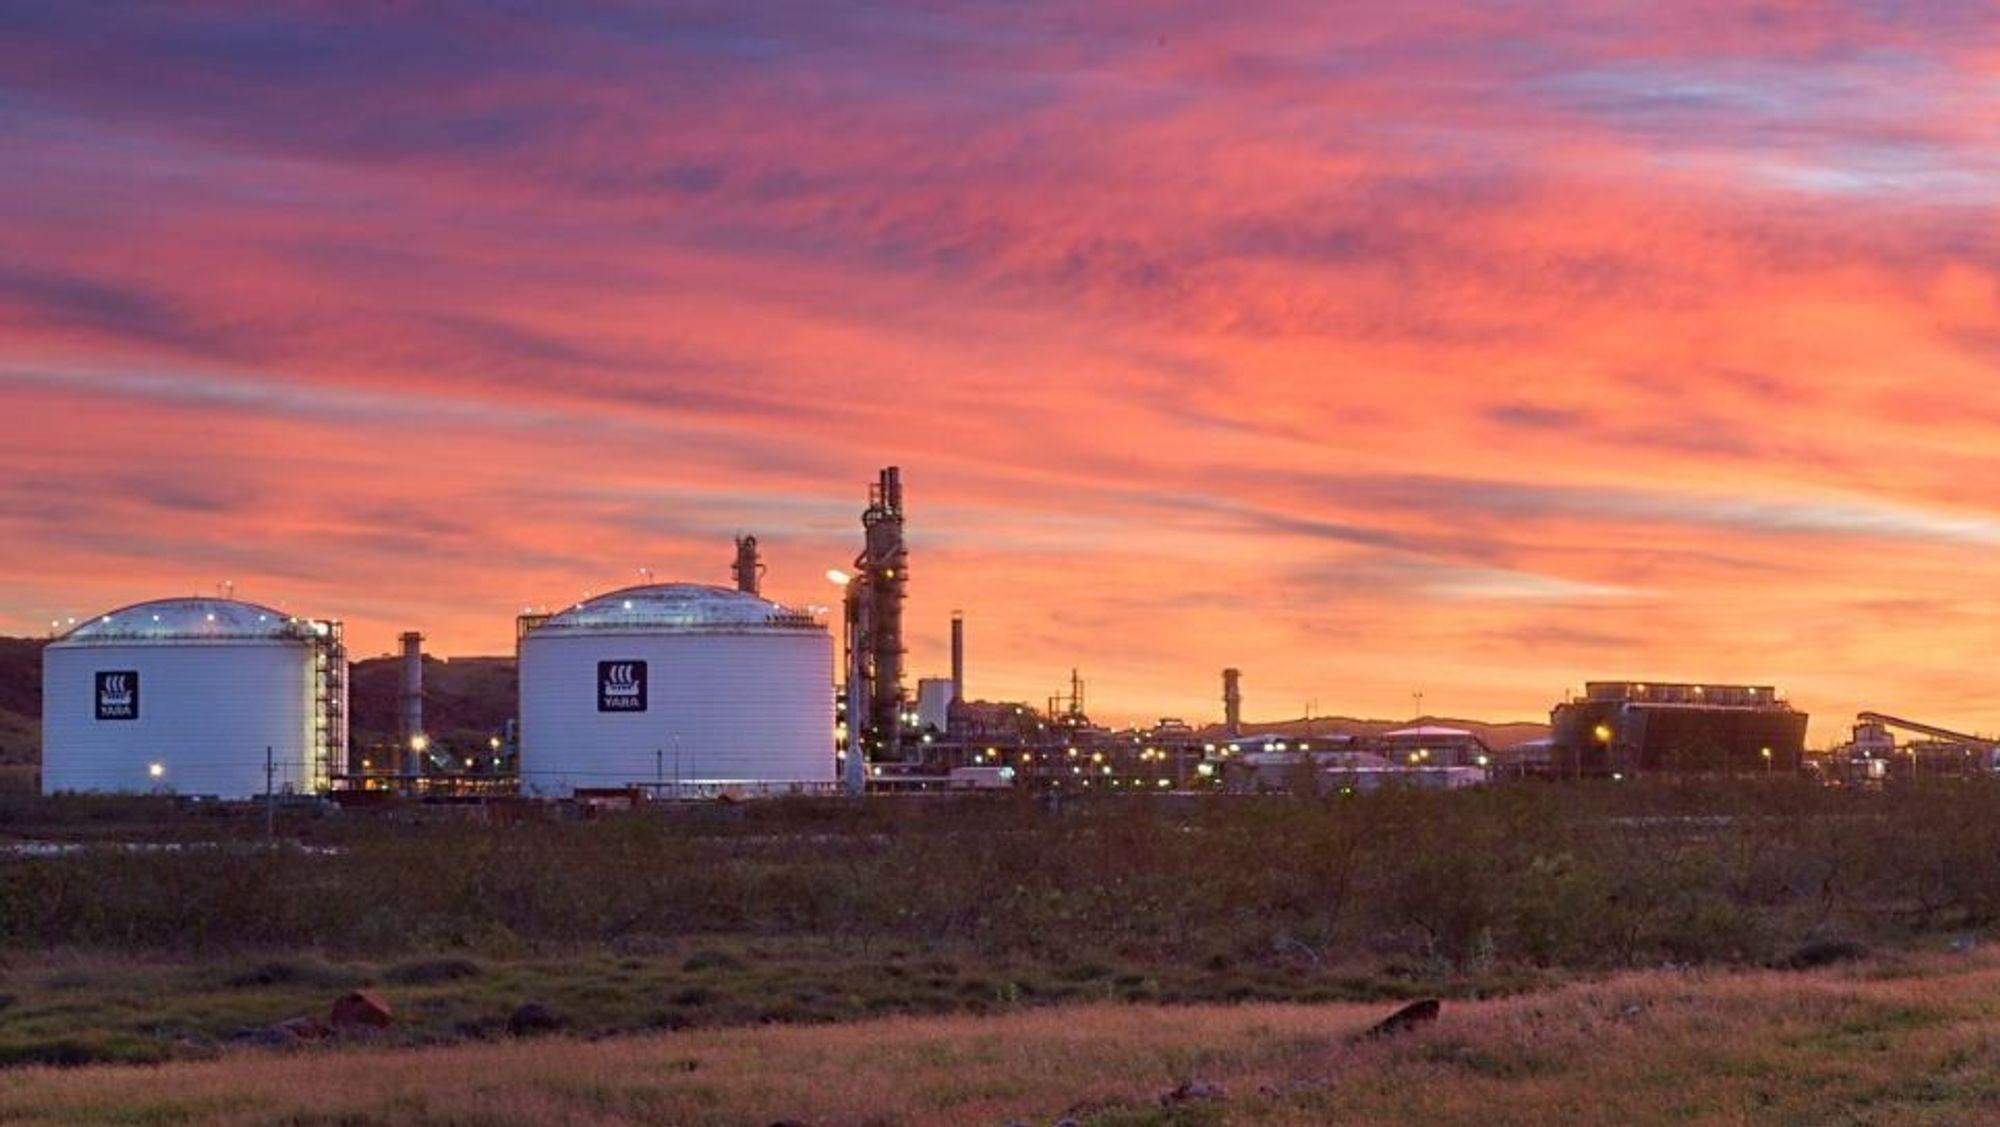 Yaras ammoniakkfabrikk i Pilbara, Australia. Årlig produksjon er 800.000 tonn NH3.